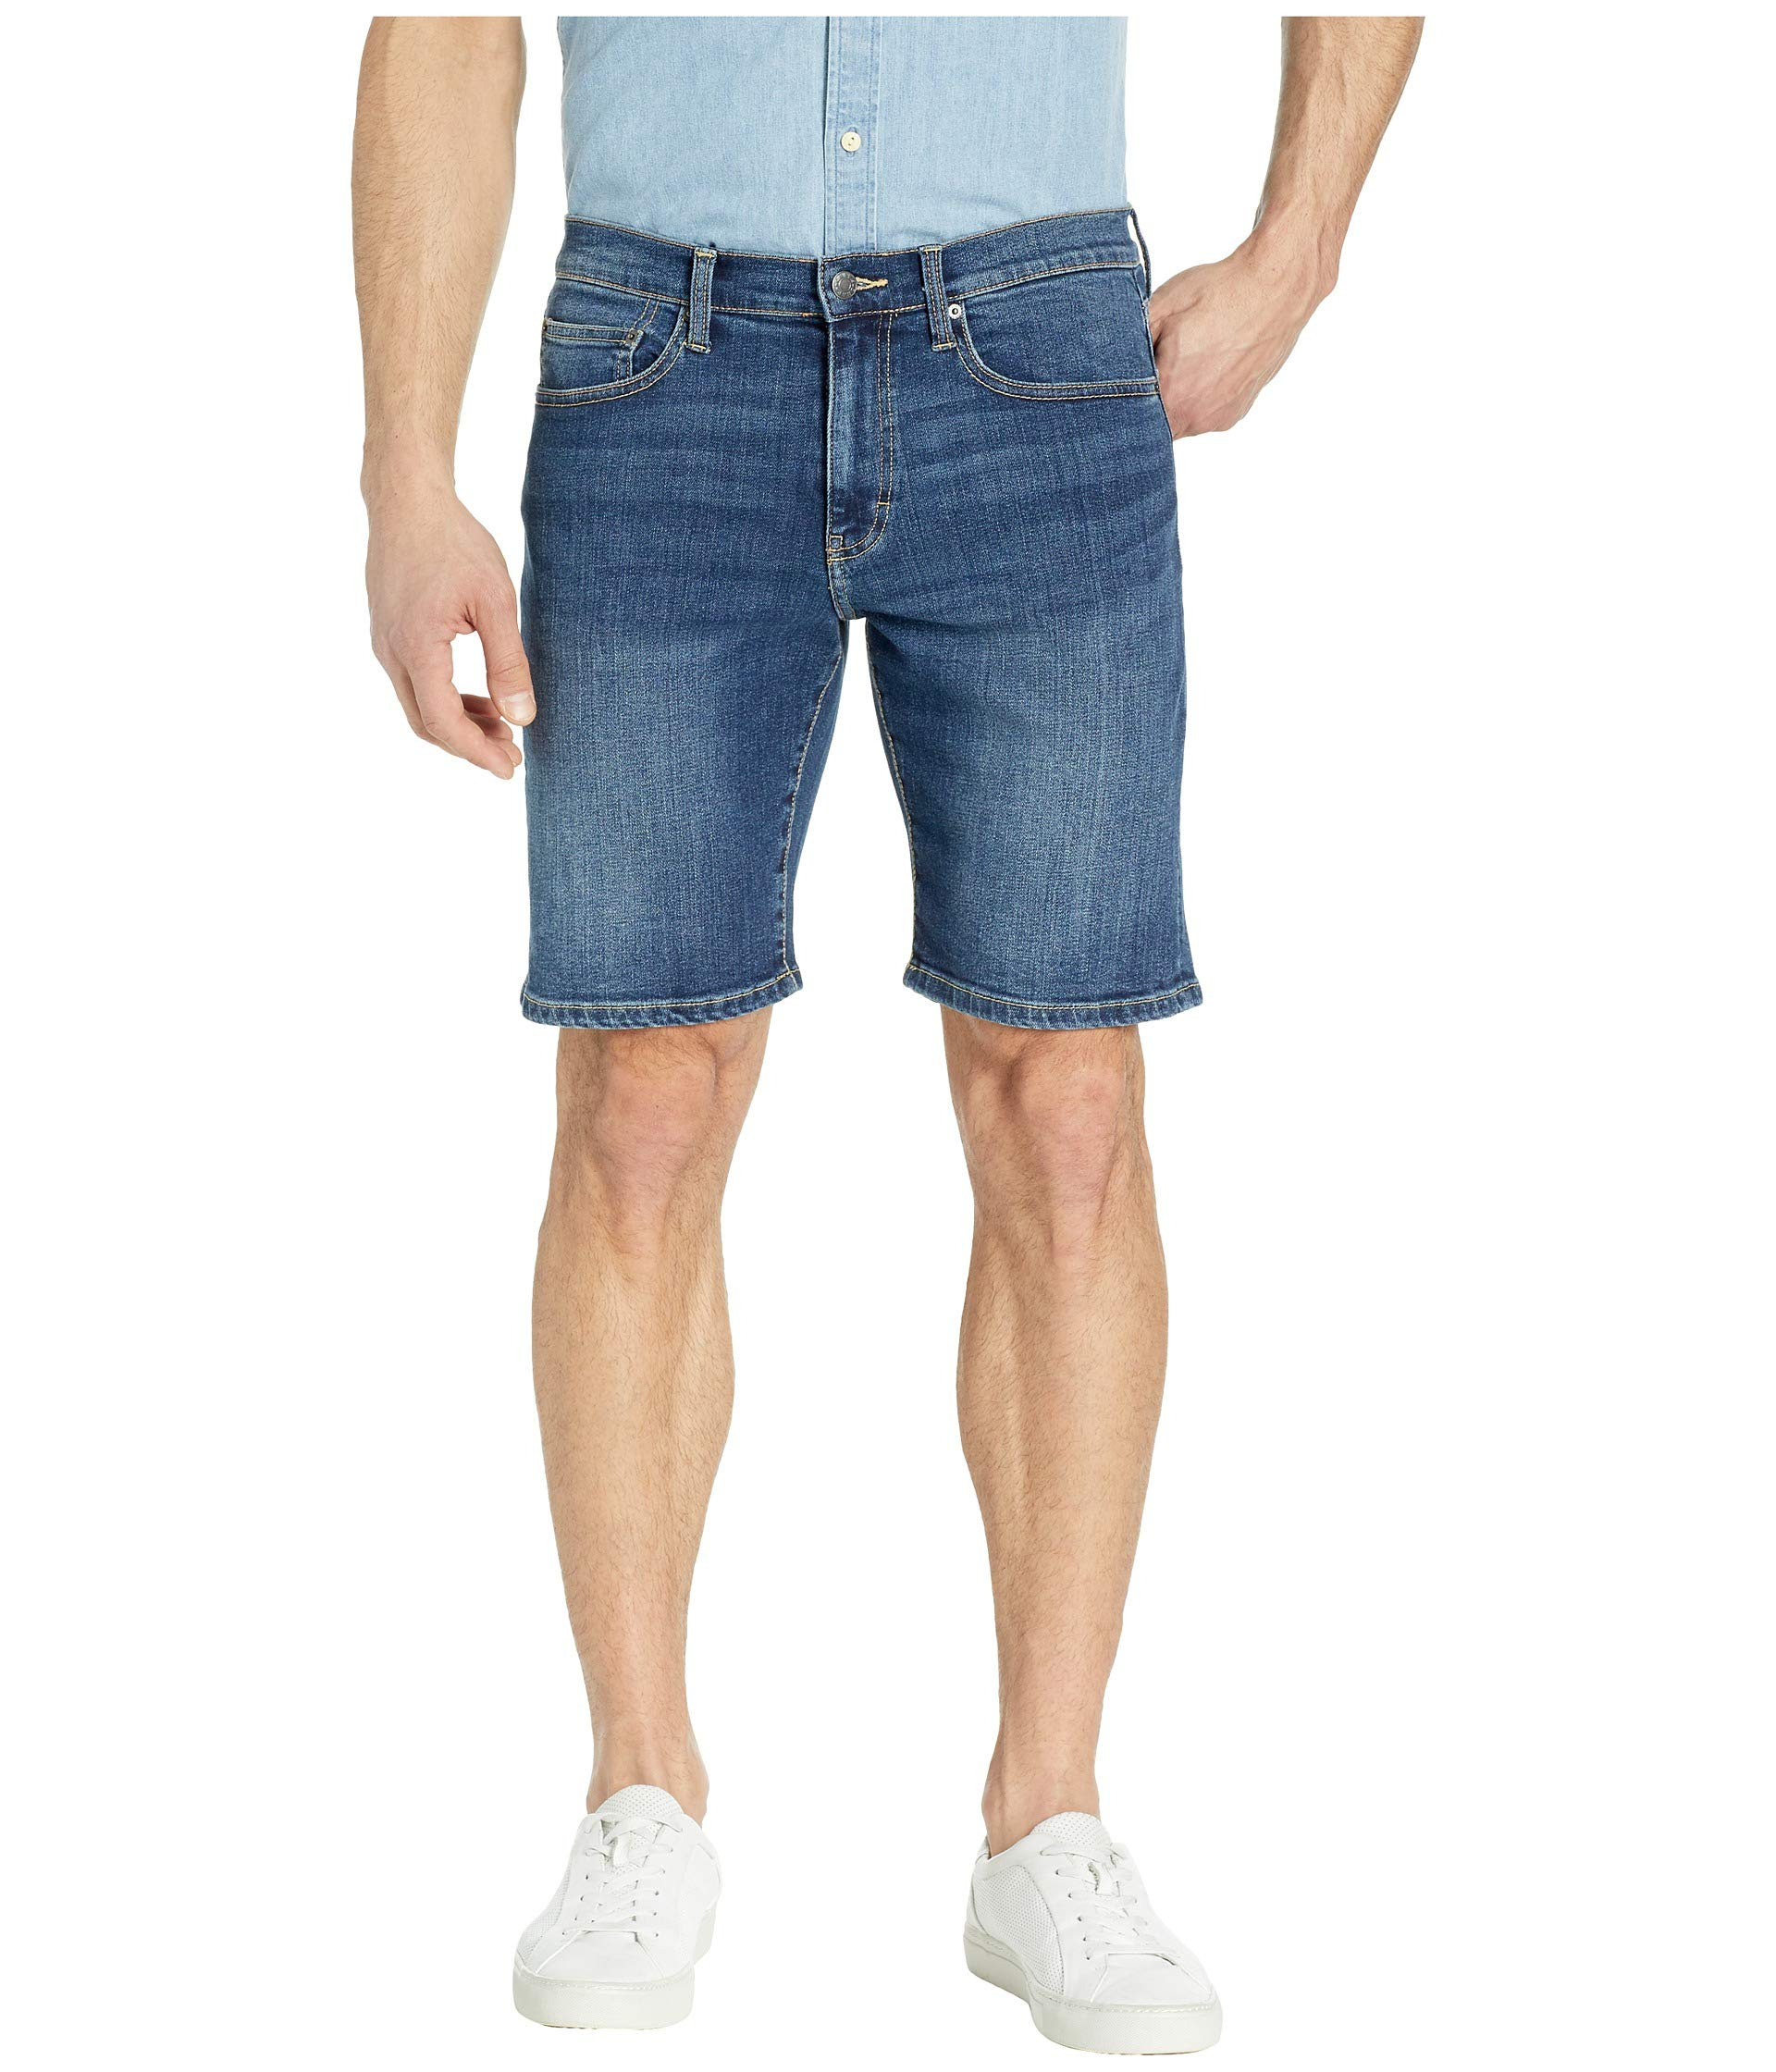 Chaps Men's Five-Pocket-Denim Shorts